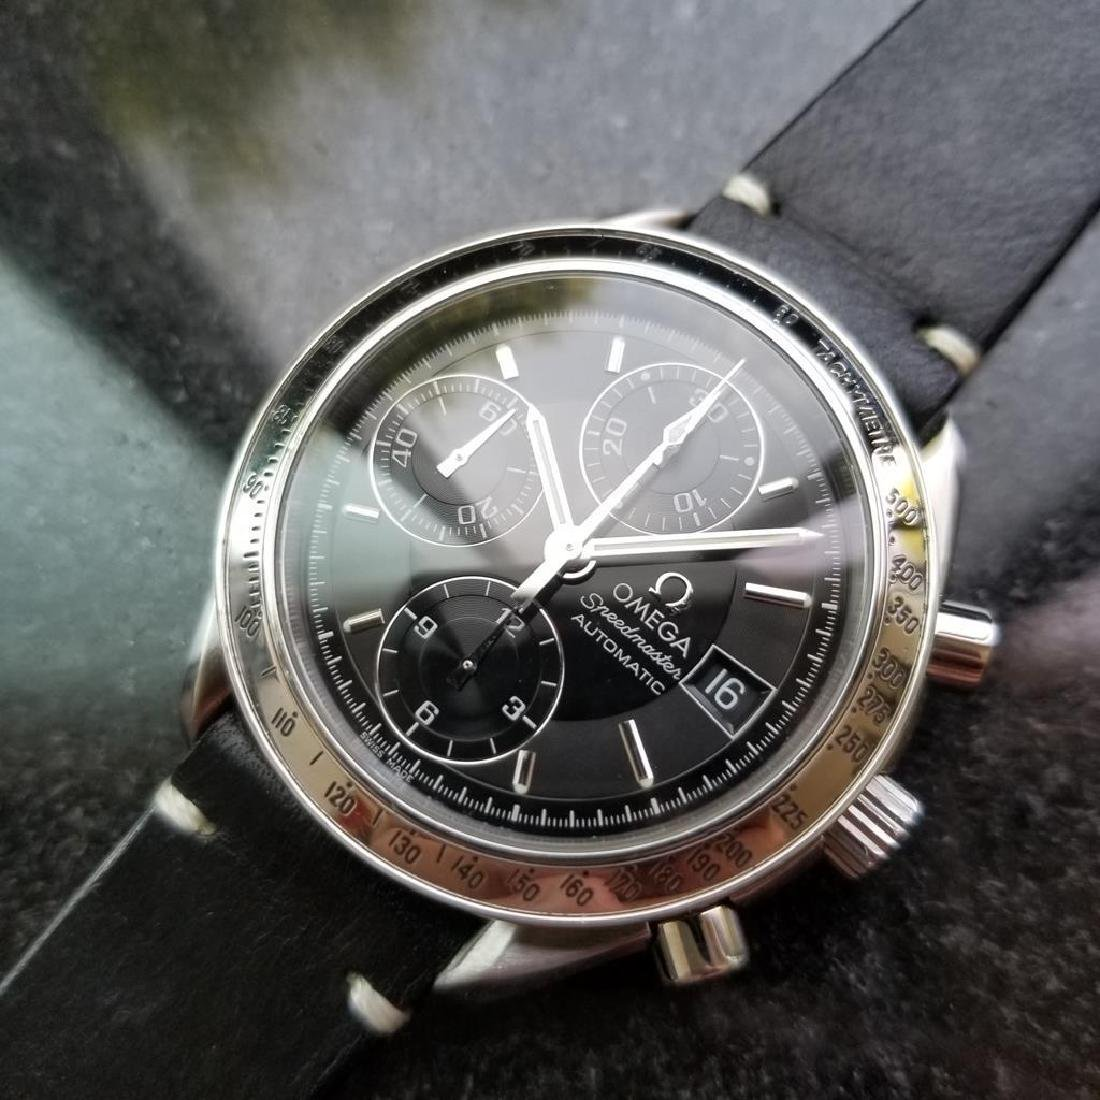 OMEGA Men's Speedmaster Automatic Chronograph 175.0083 - 2